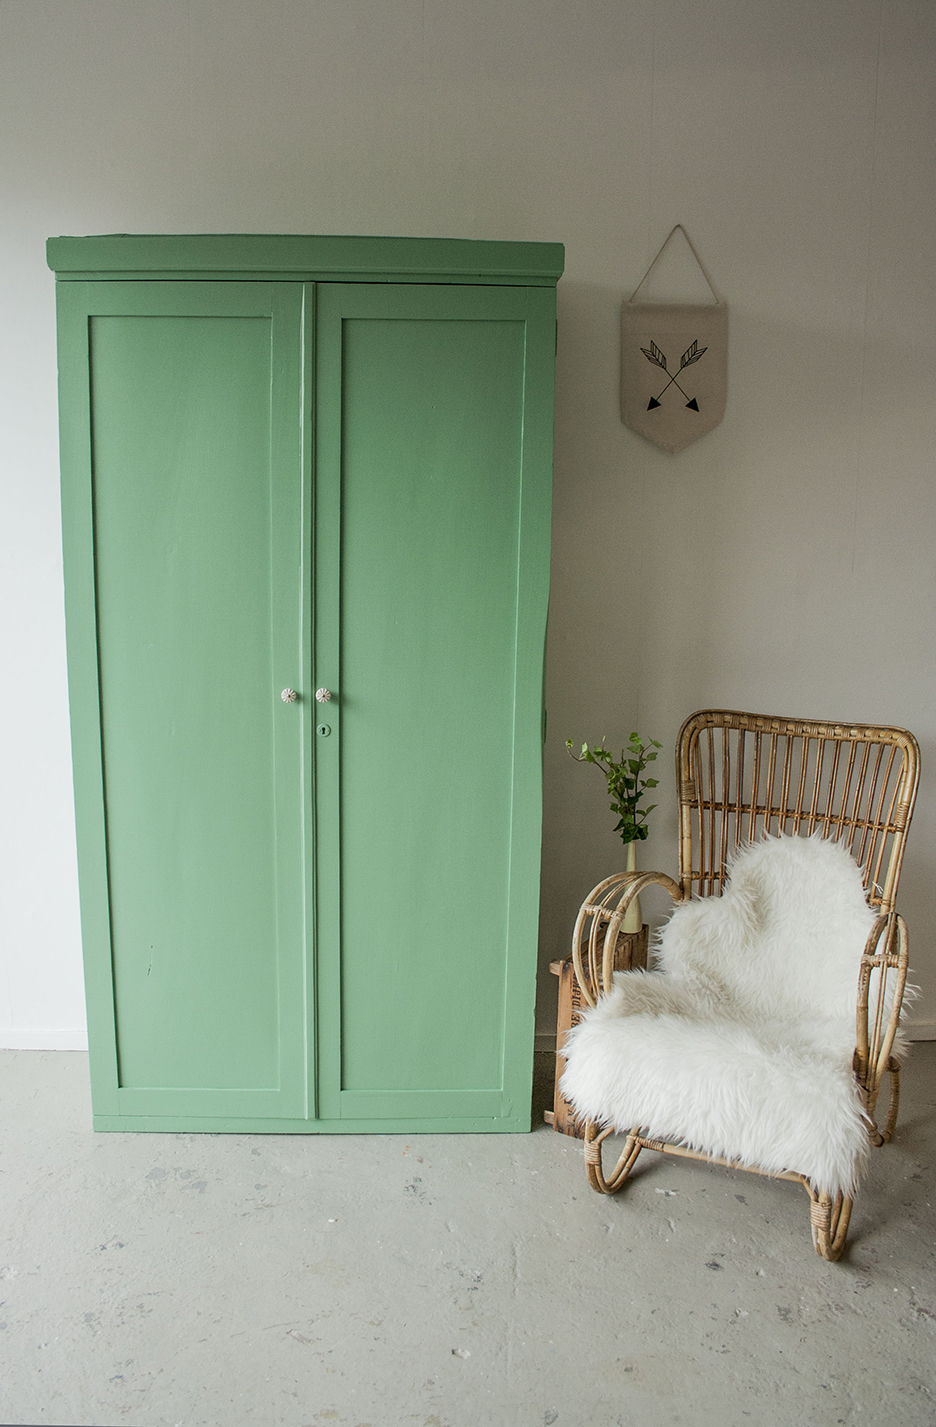 Frisgroene vintage kledingkast - Firma Zoethout_1.jpg